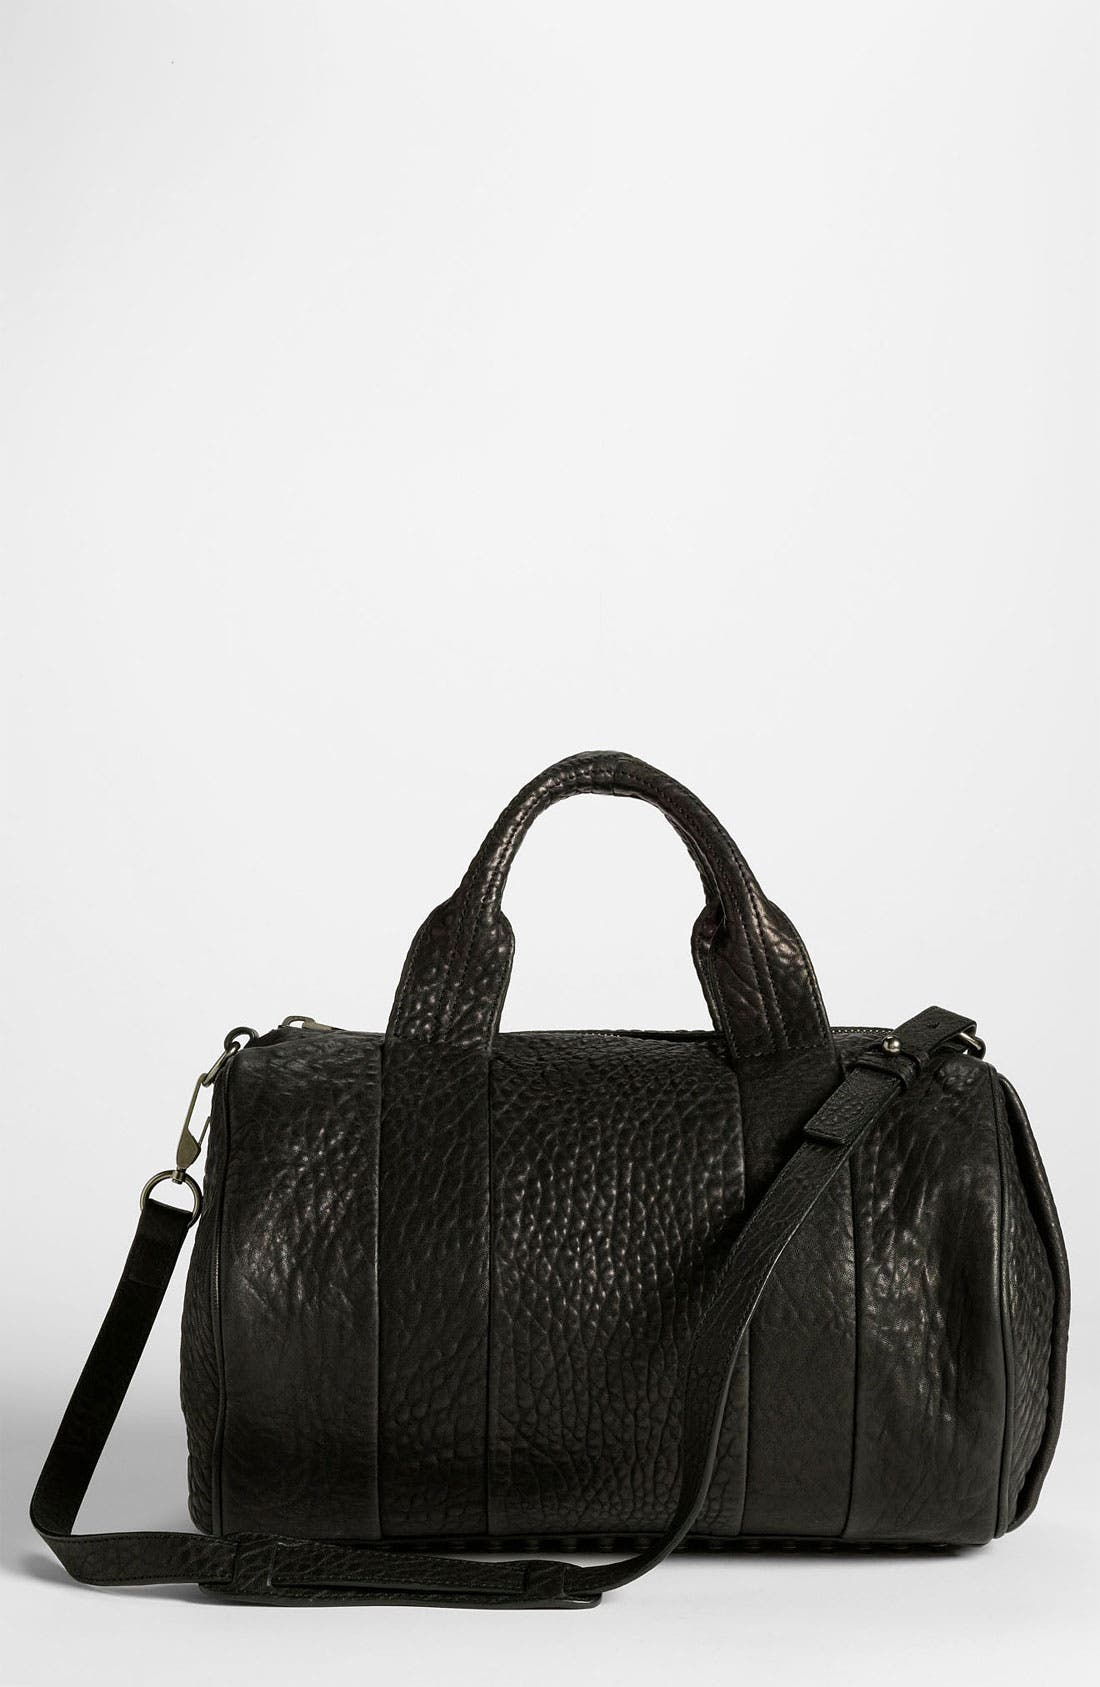 Alternate Image 1 Selected - Alexander Wang 'Rocco - Black Nickel' Leather Satchel